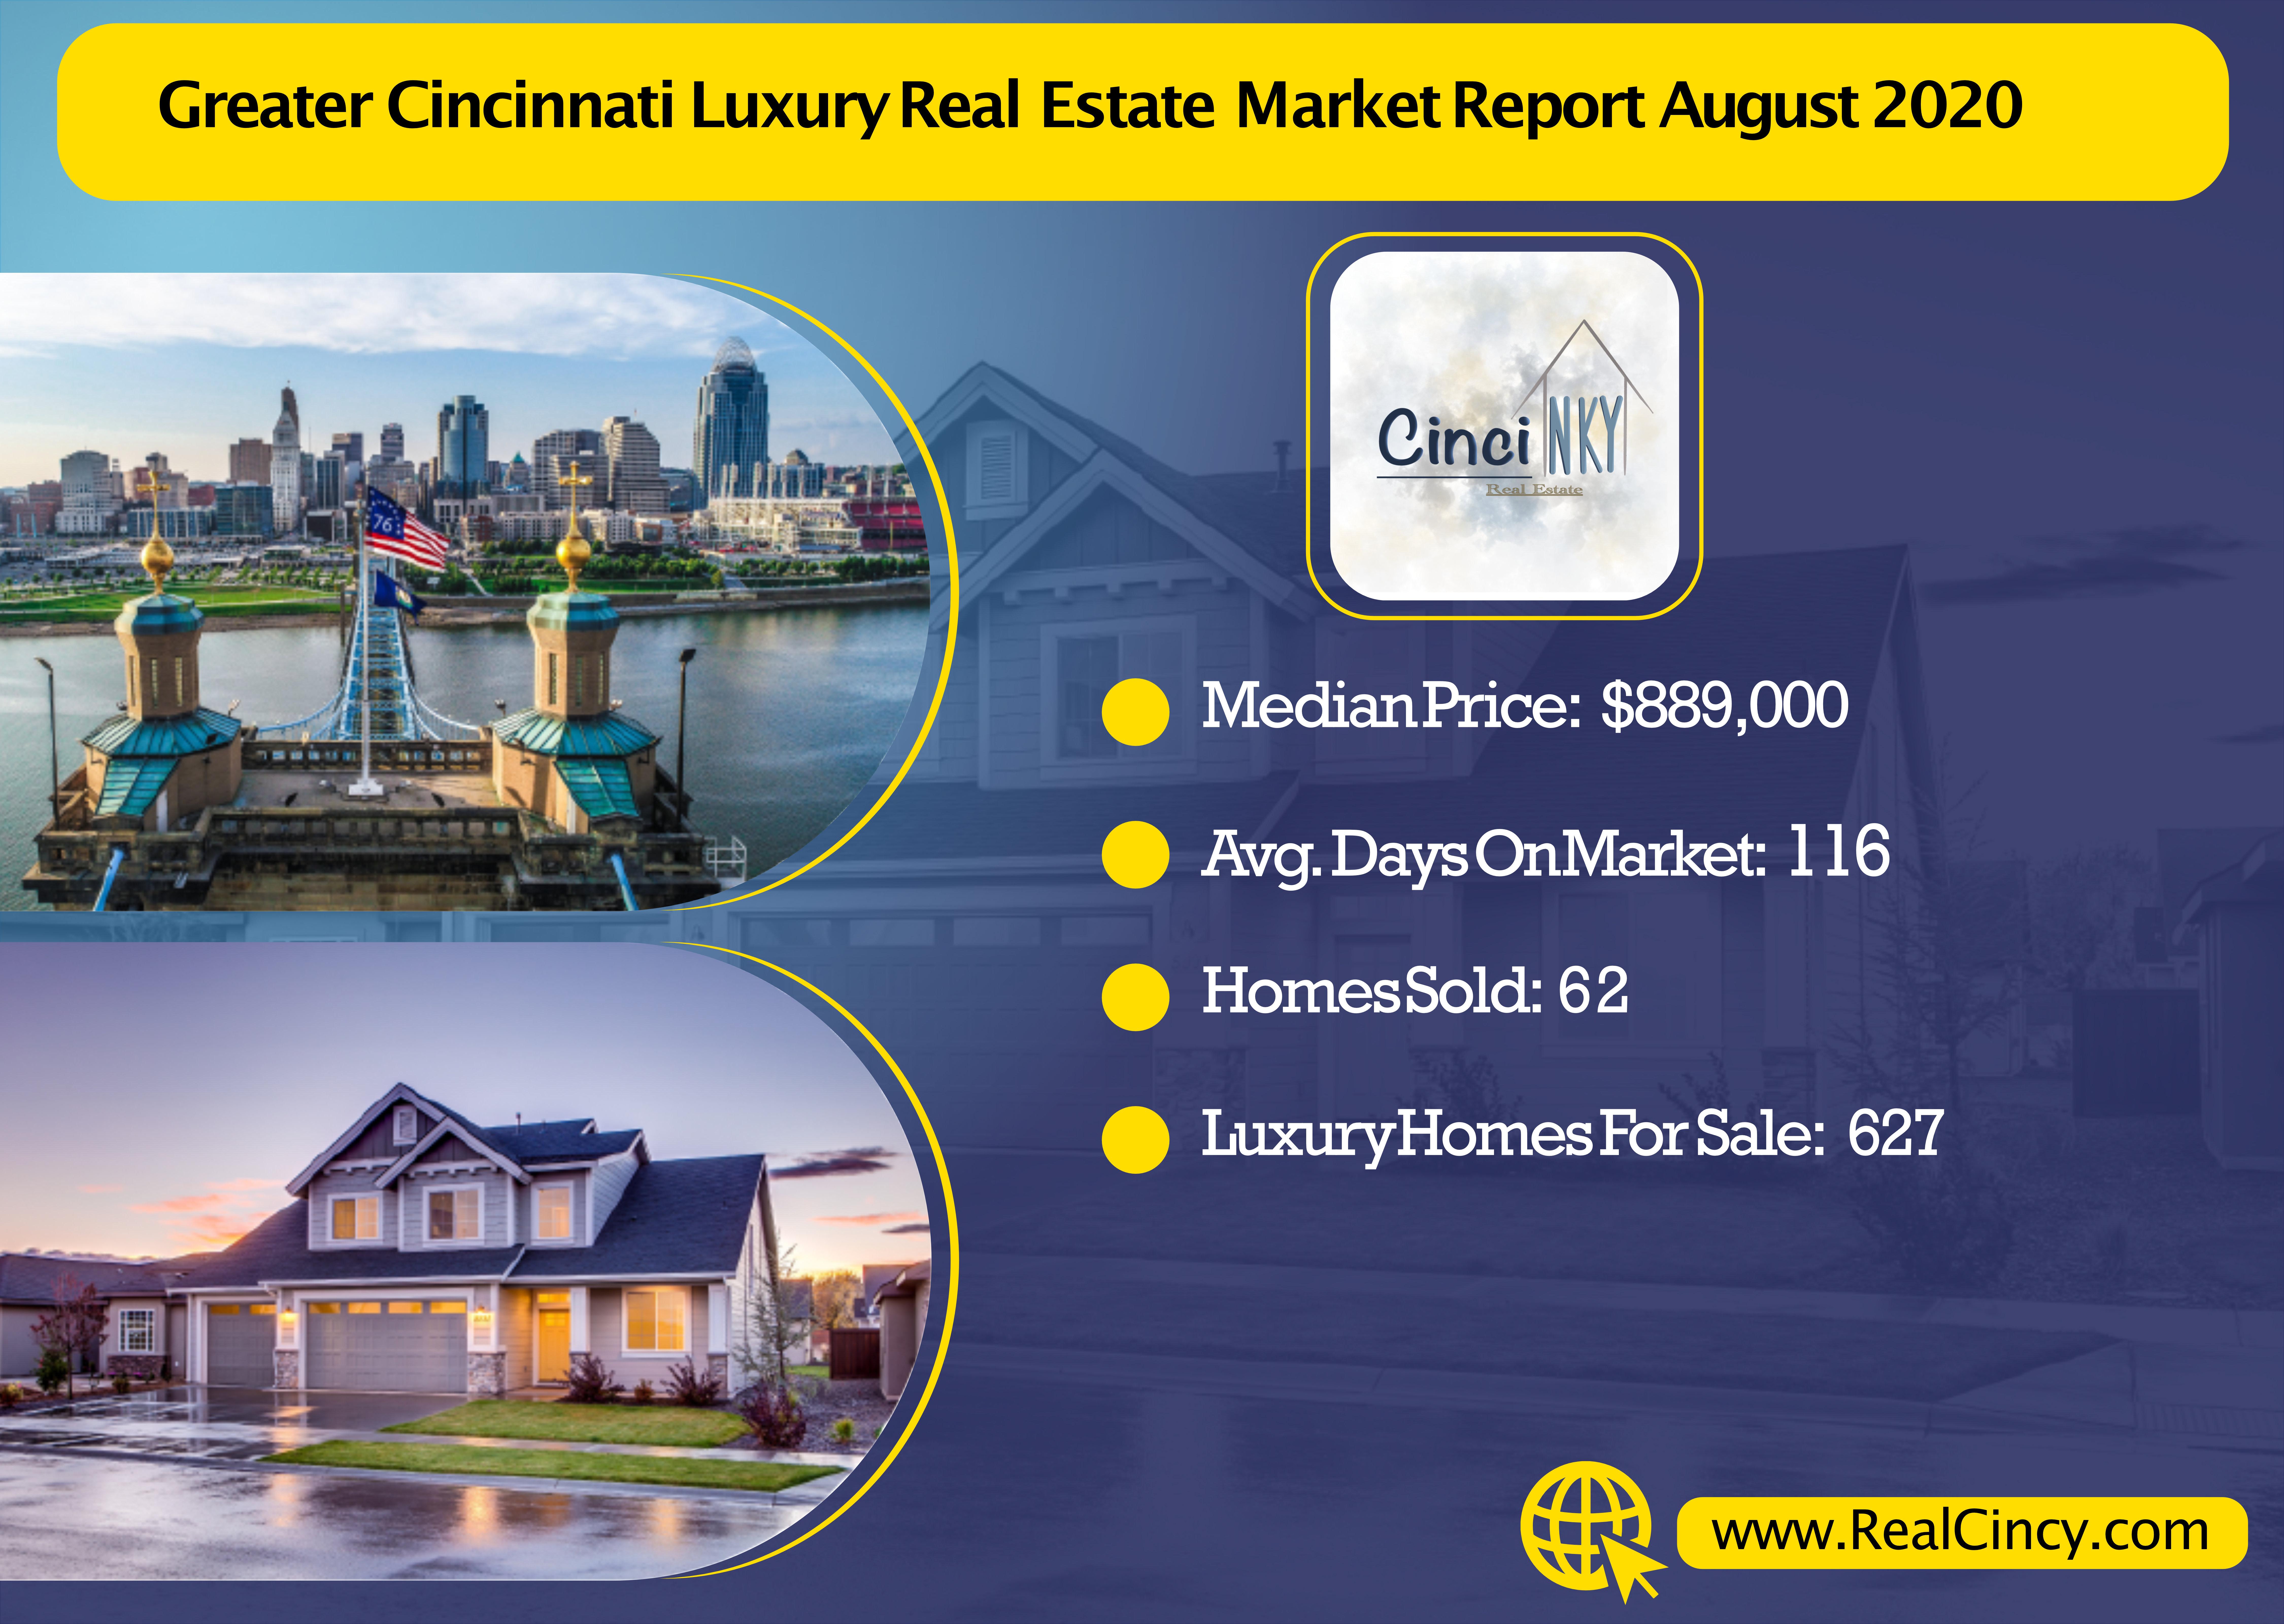 greater cincinnati luxury real estate market report august 2020